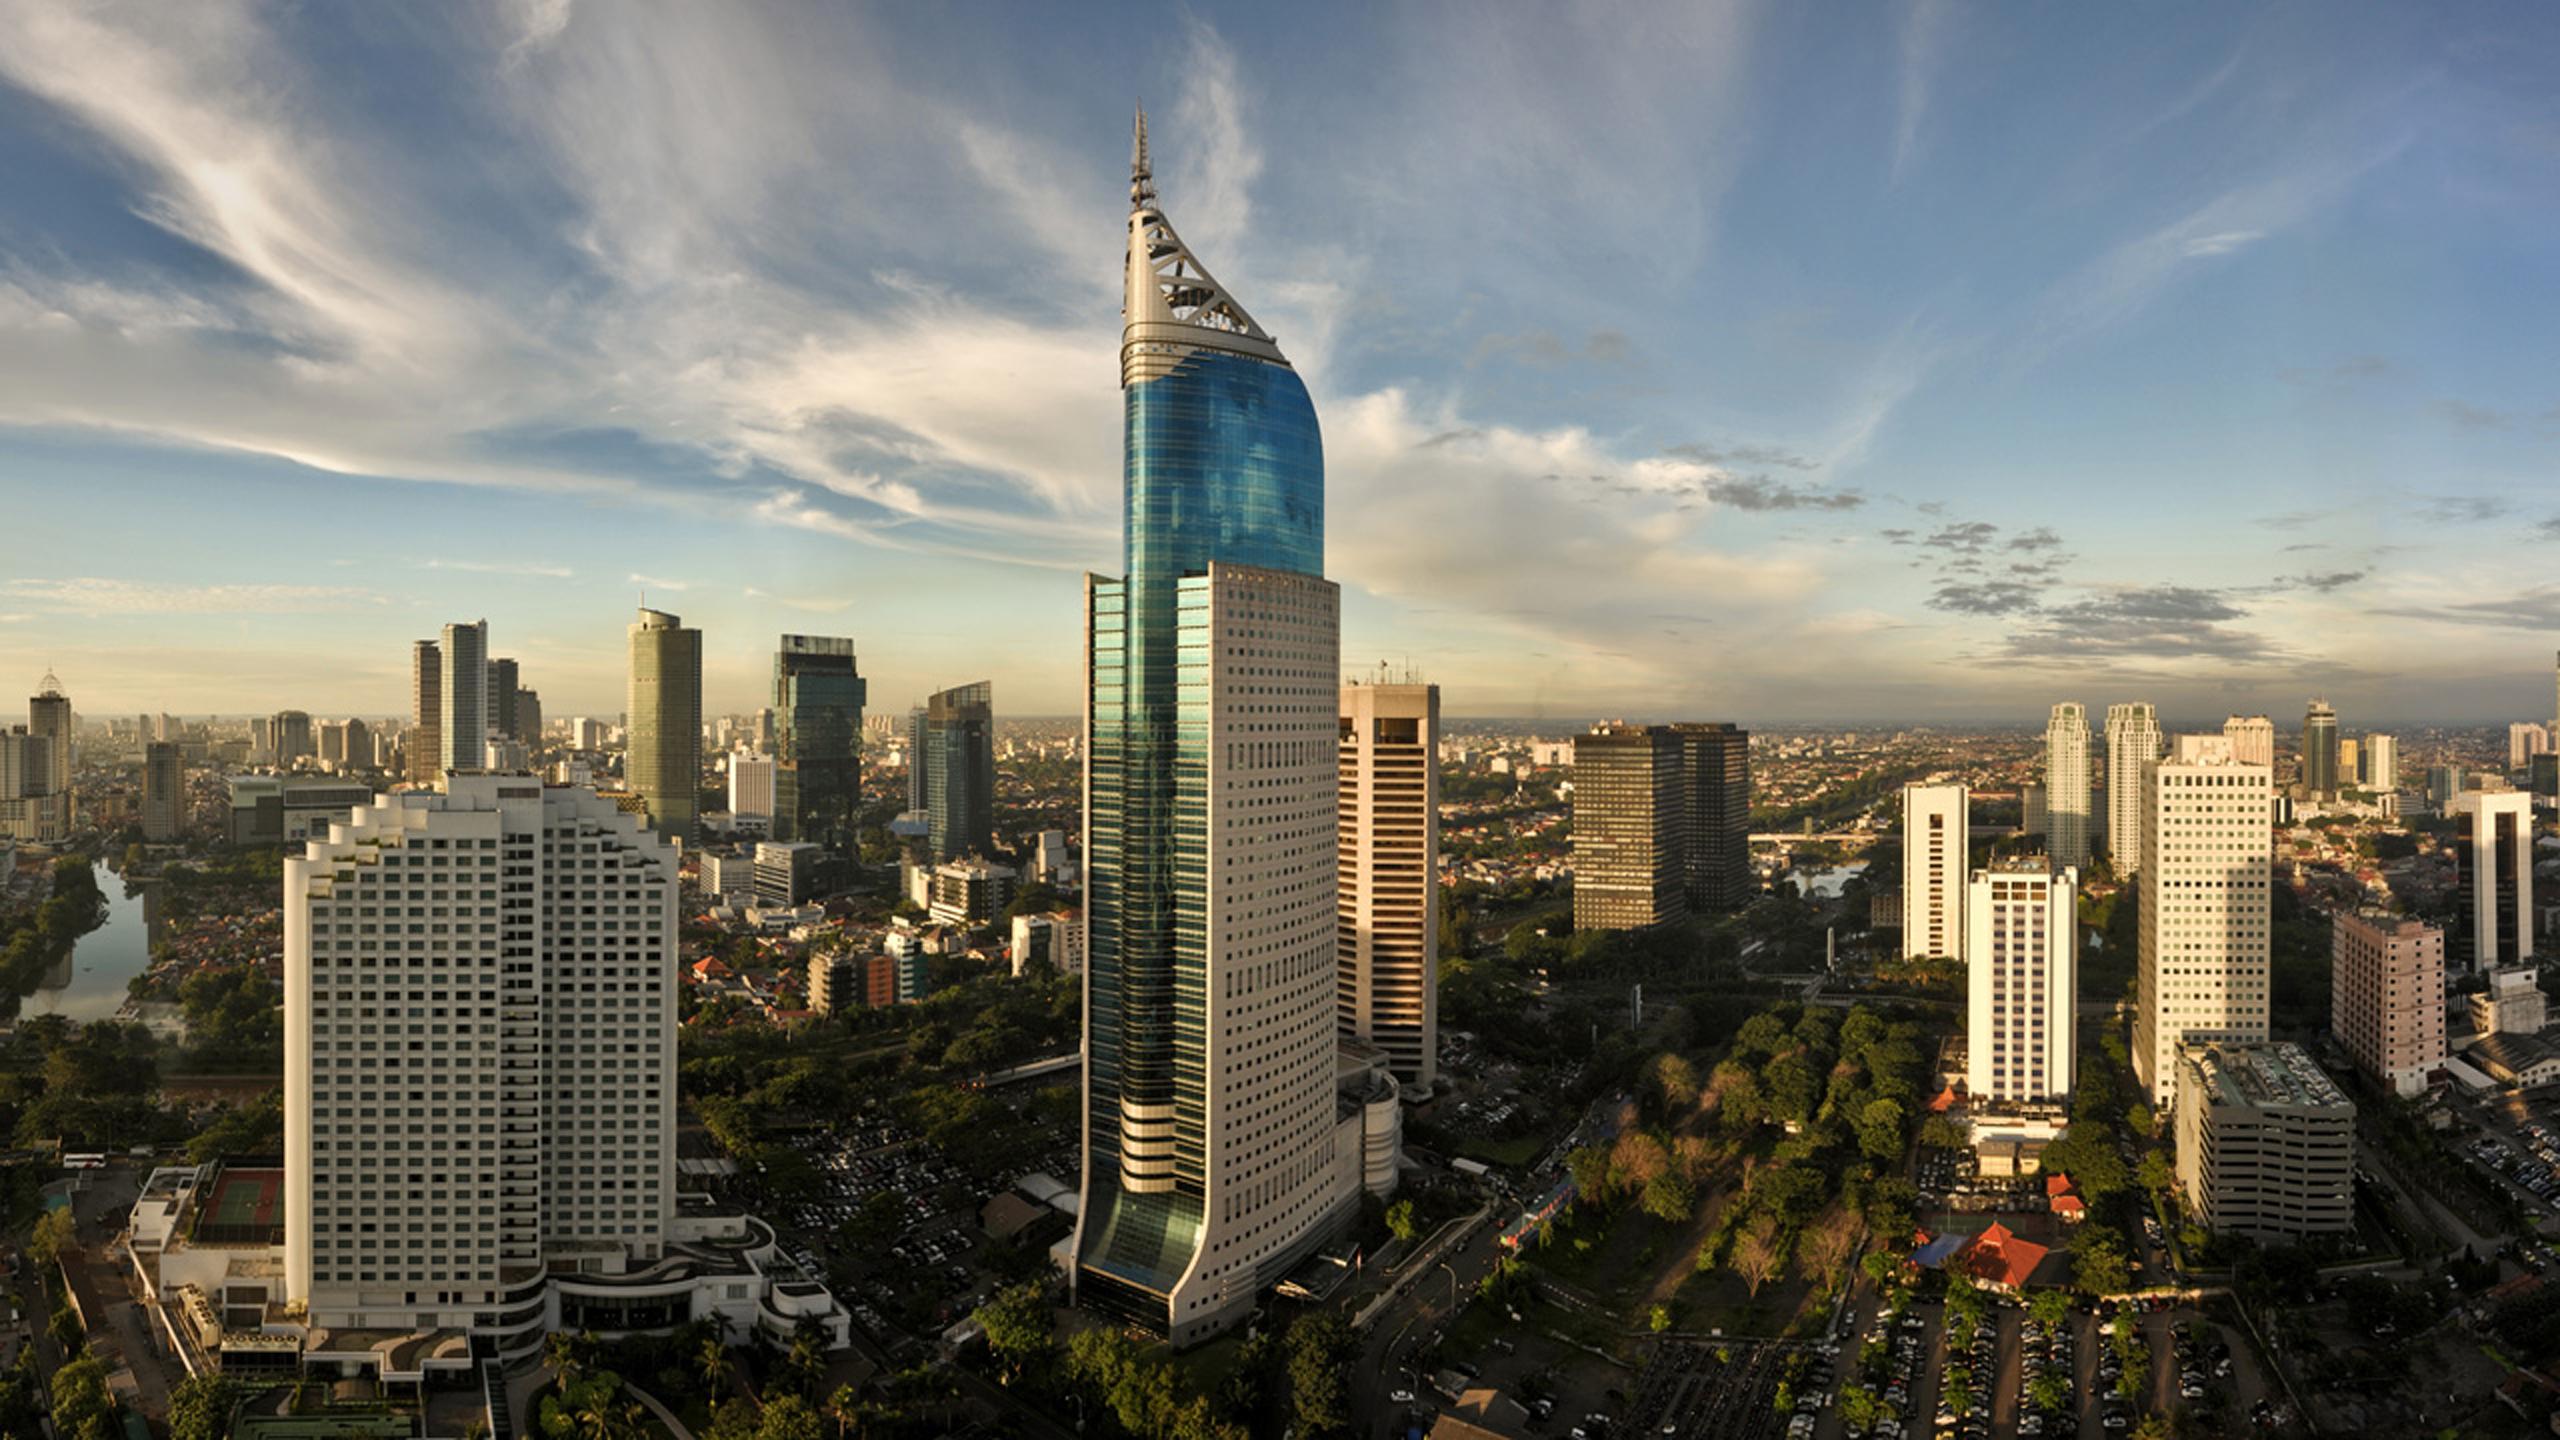 Night King Hd Wallpaper Jakarta Indonesia Skyline Wallpaper Hd Wallpapers13 Com